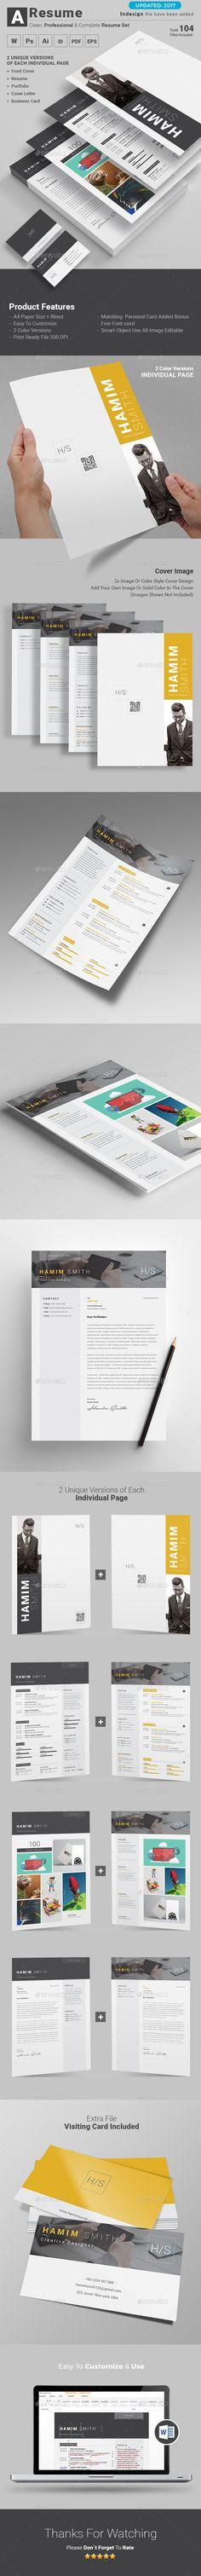 Dynamic Resume Cv template, Resume cv and Creative cv template - graphic design resume template download